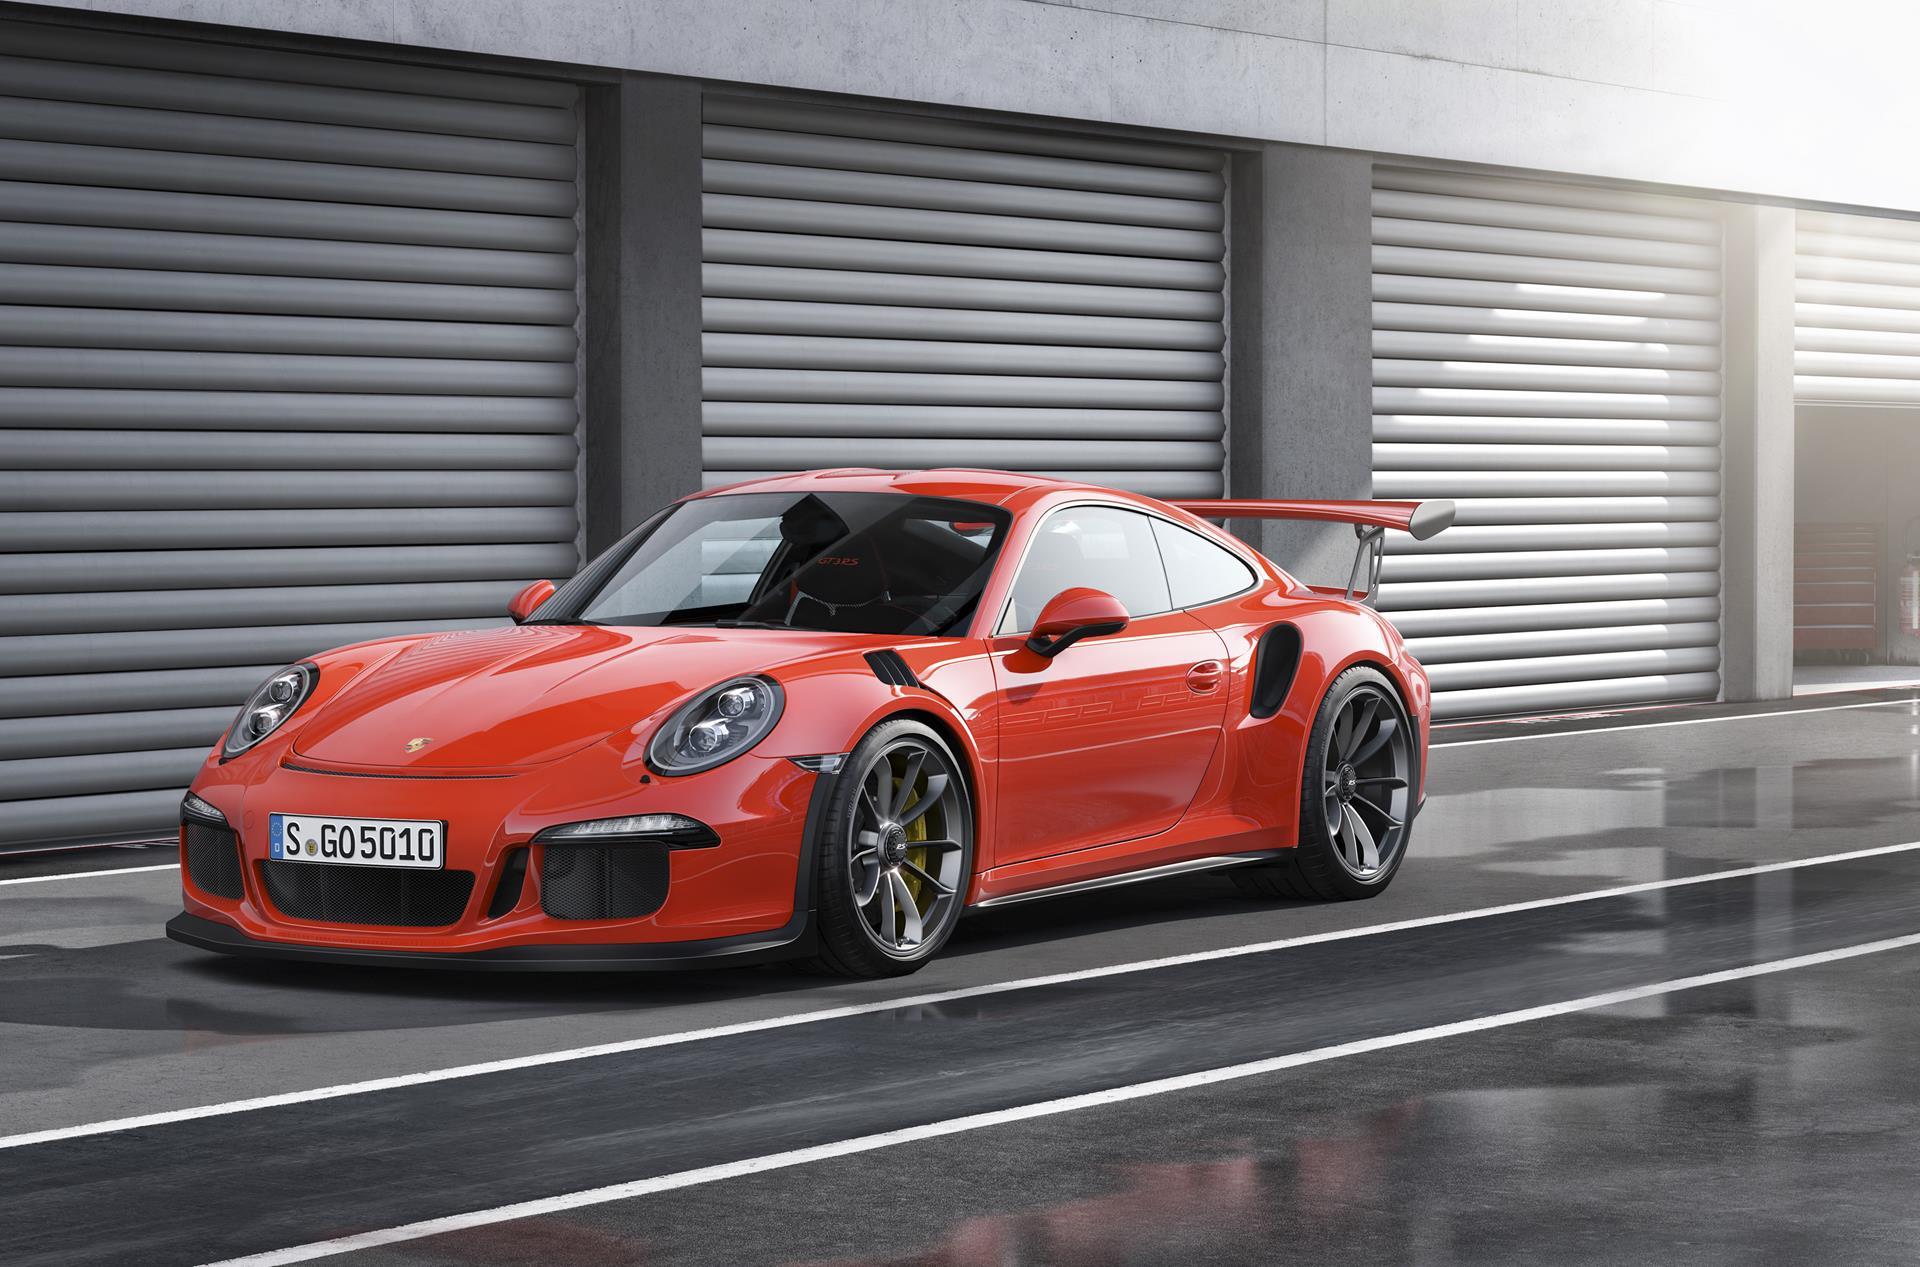 2015-Porsche-911-GT3-Coupe-Photo-01 Terrific 2002 Porsche 911 Carrera Turbo Gt2 X50 Cars Trend